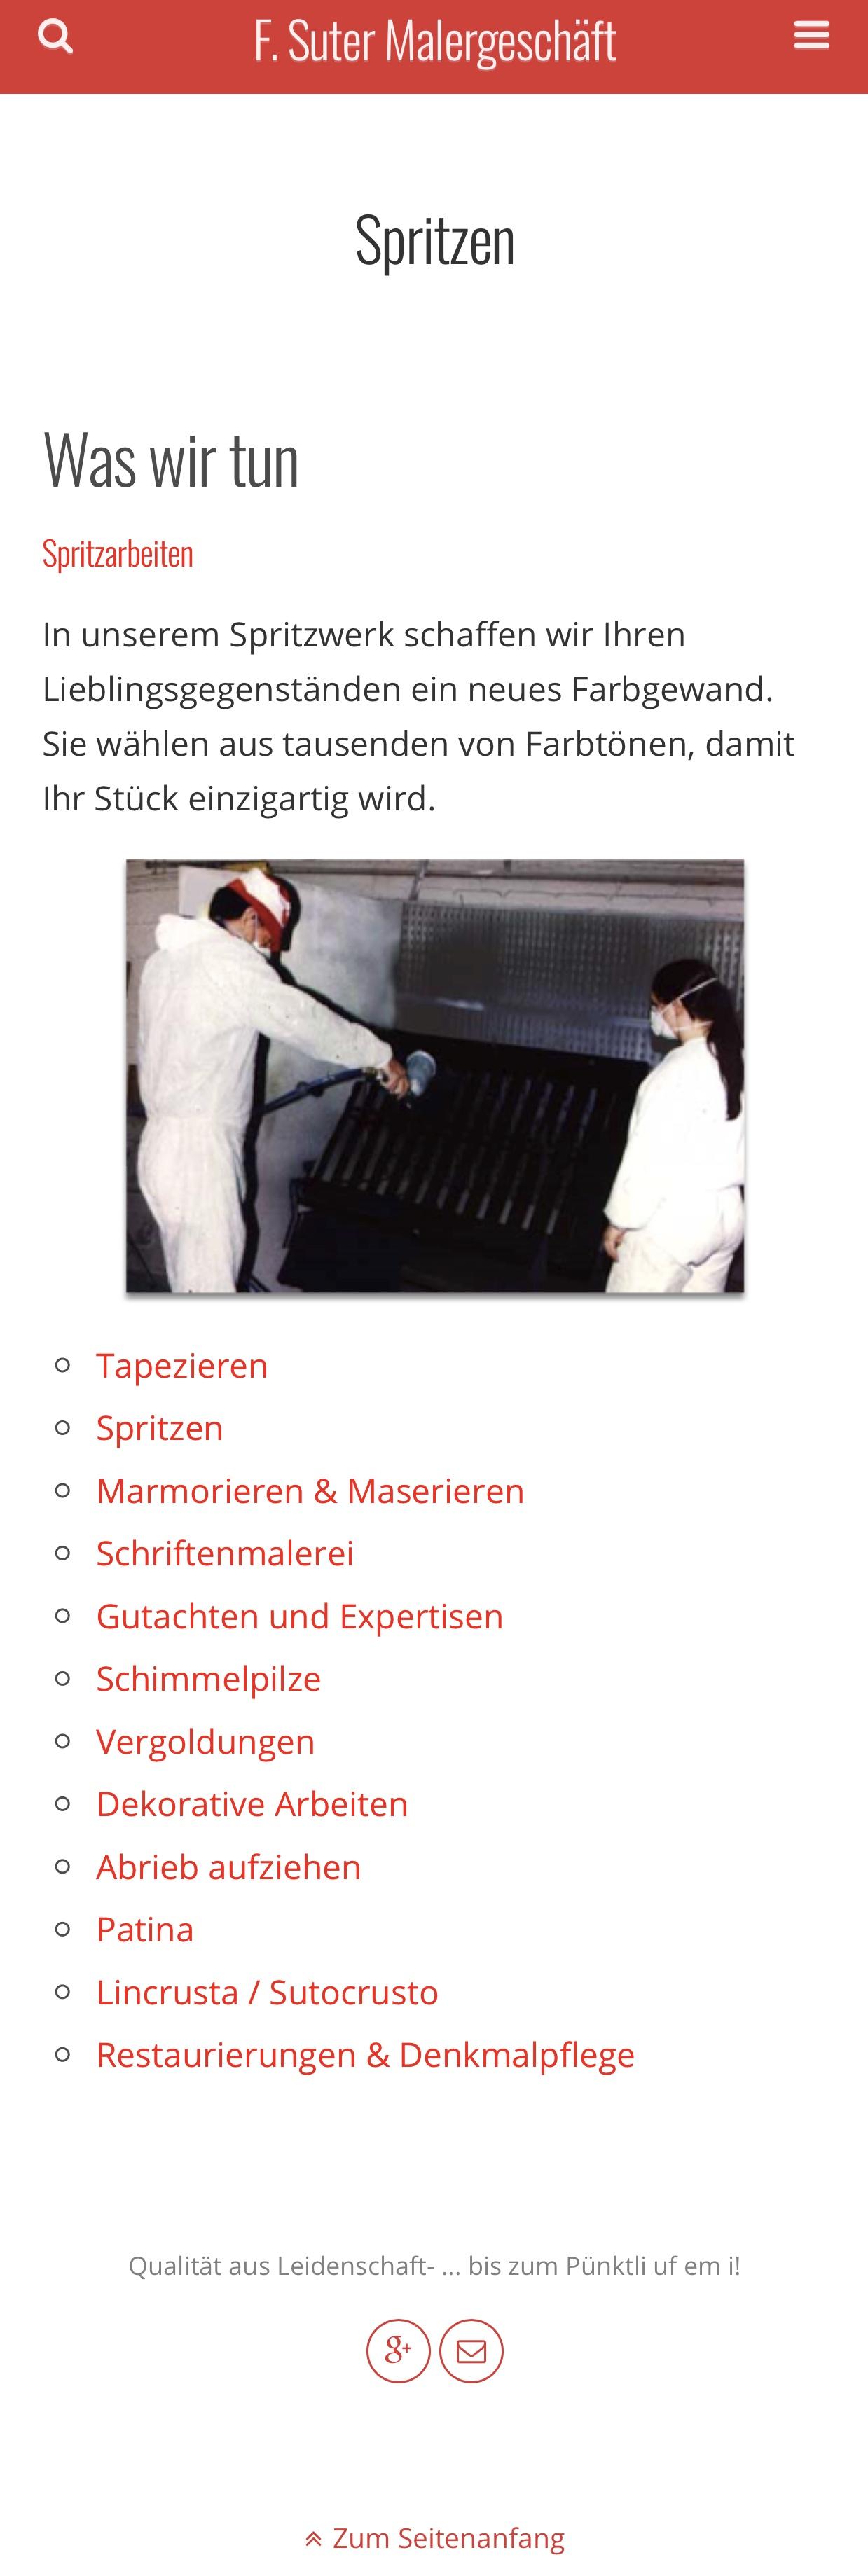 spritzen-classic-mobile.jpg